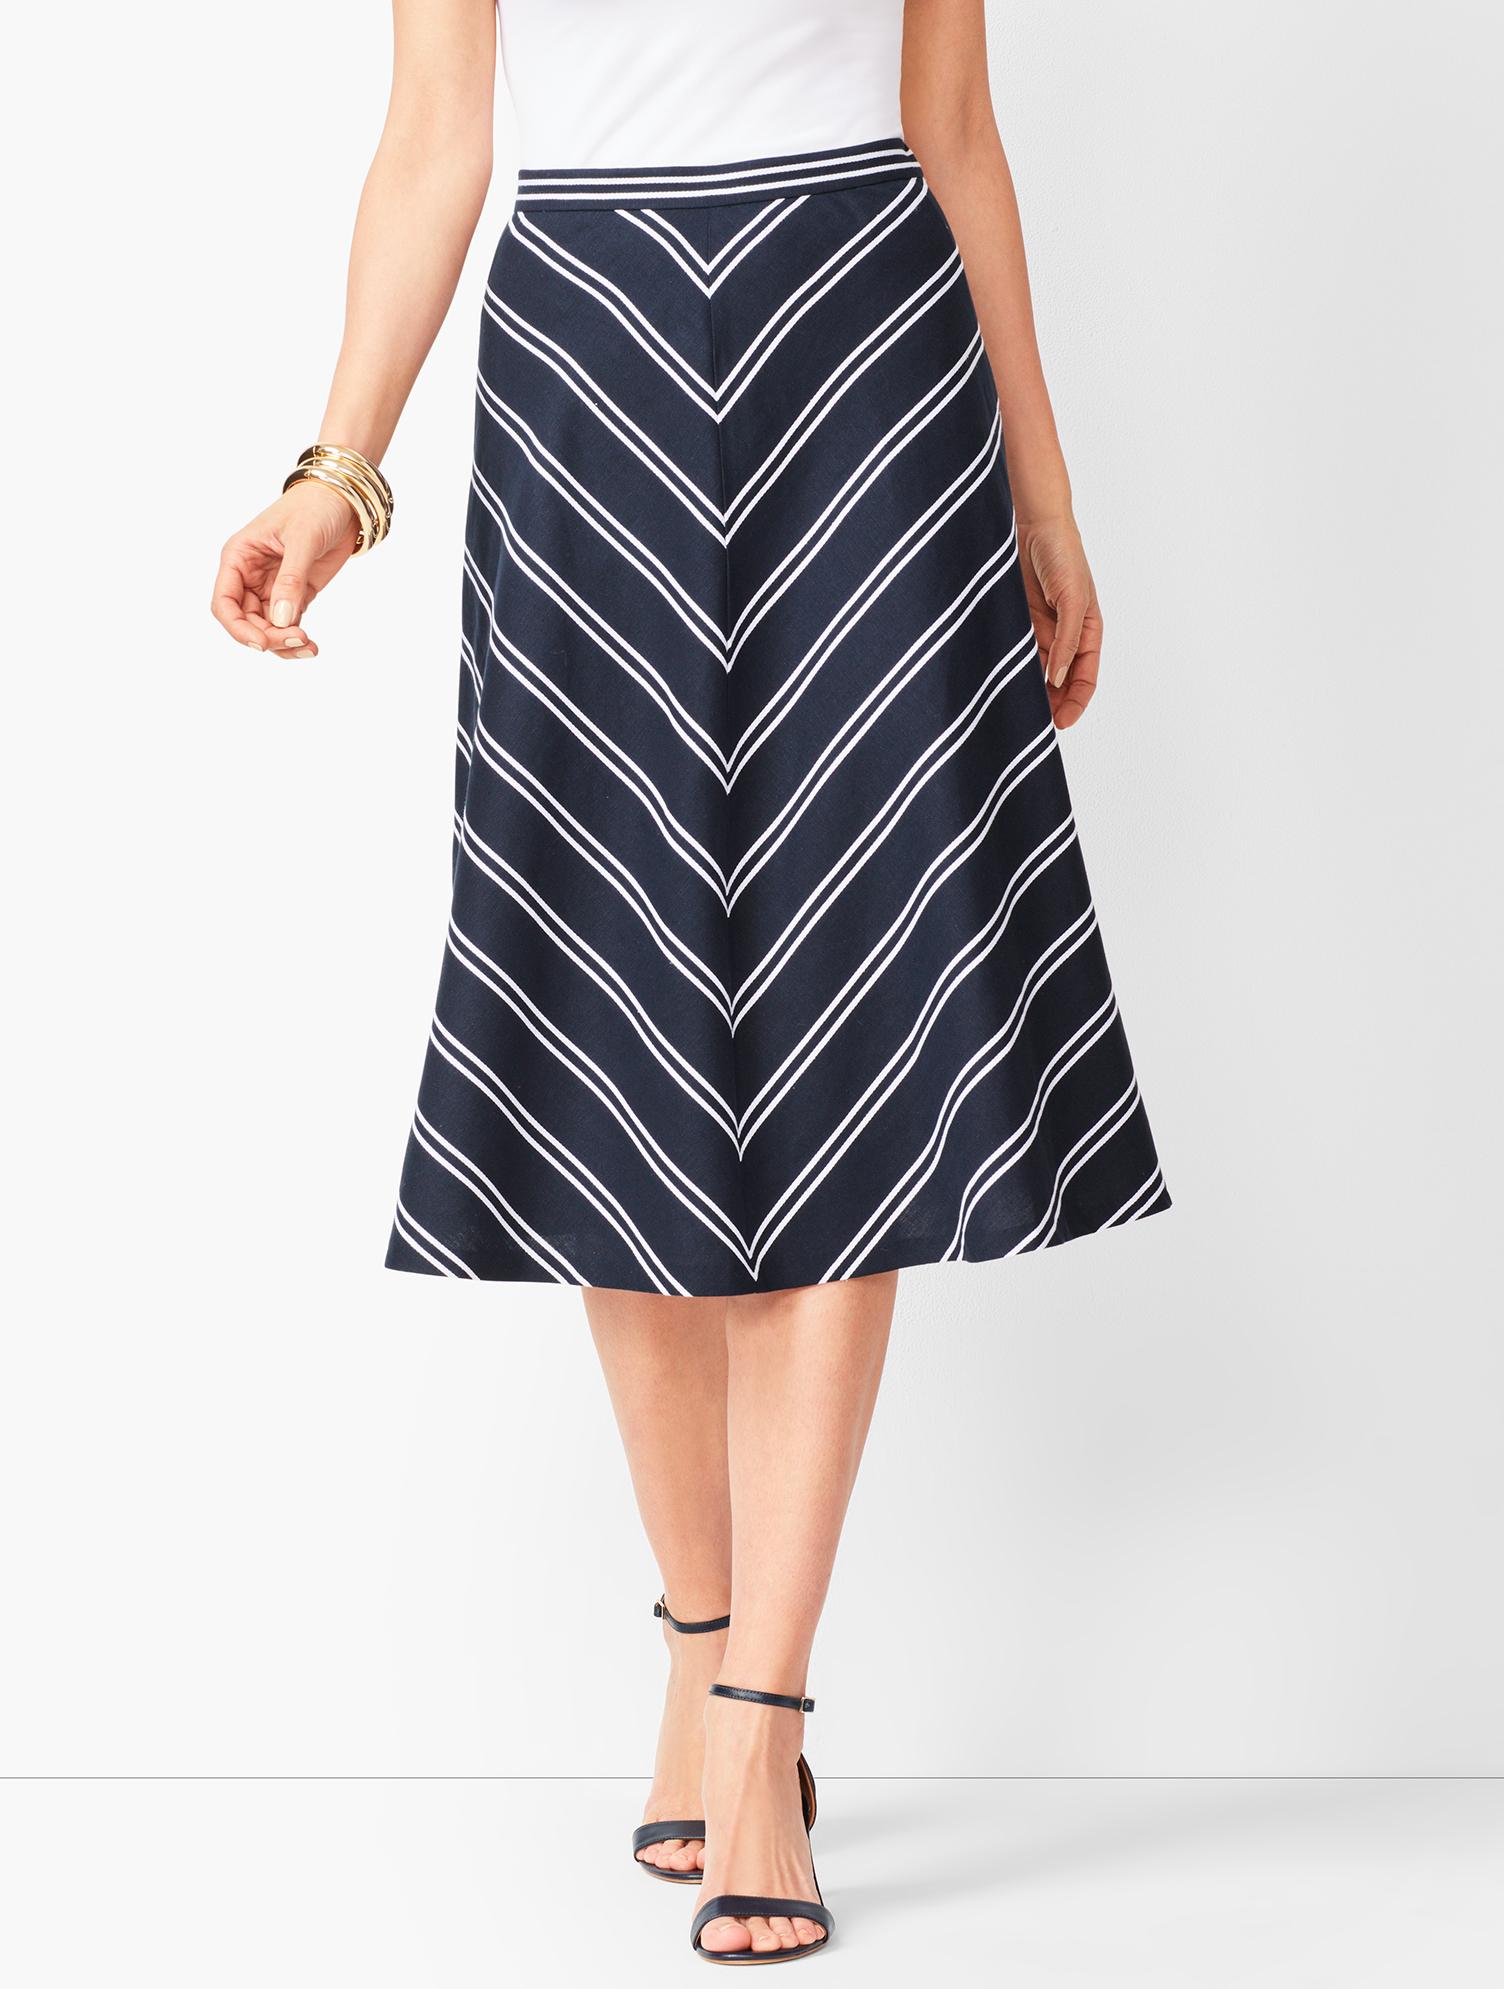 60s Skirts | 70s Hippie Skirts, Jumper Dresses Dobby-weave Stripe Midi Skirt - INDIGO-BLUEWHITE - 14 - Talbots $26.24 AT vintagedancer.com